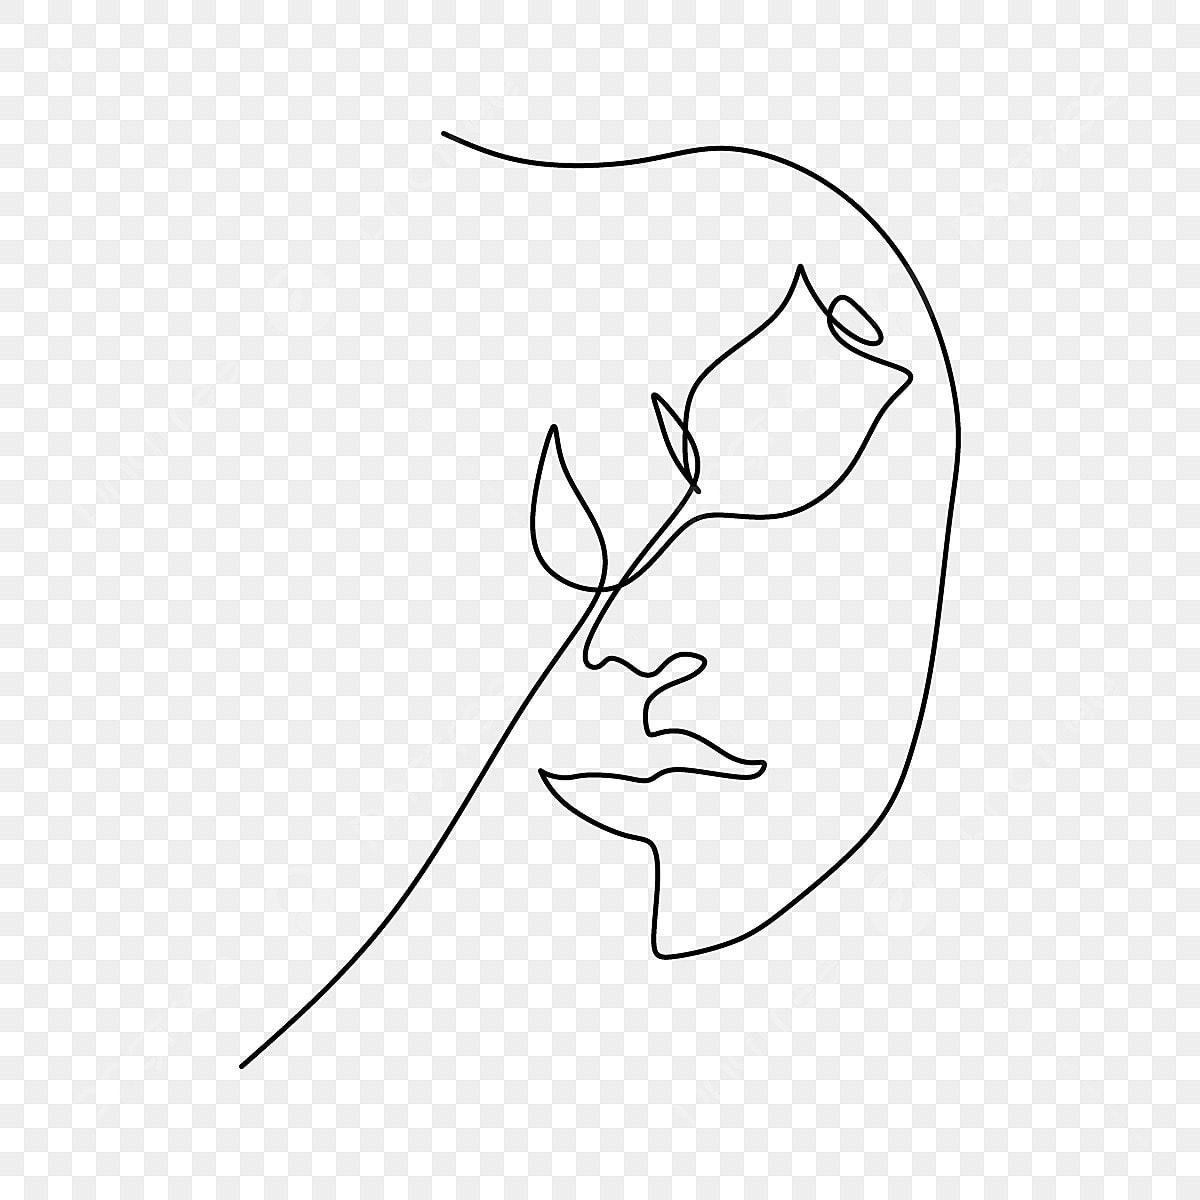 89+ Gambar Abstrak Wajah Perempuan Paling Bagus